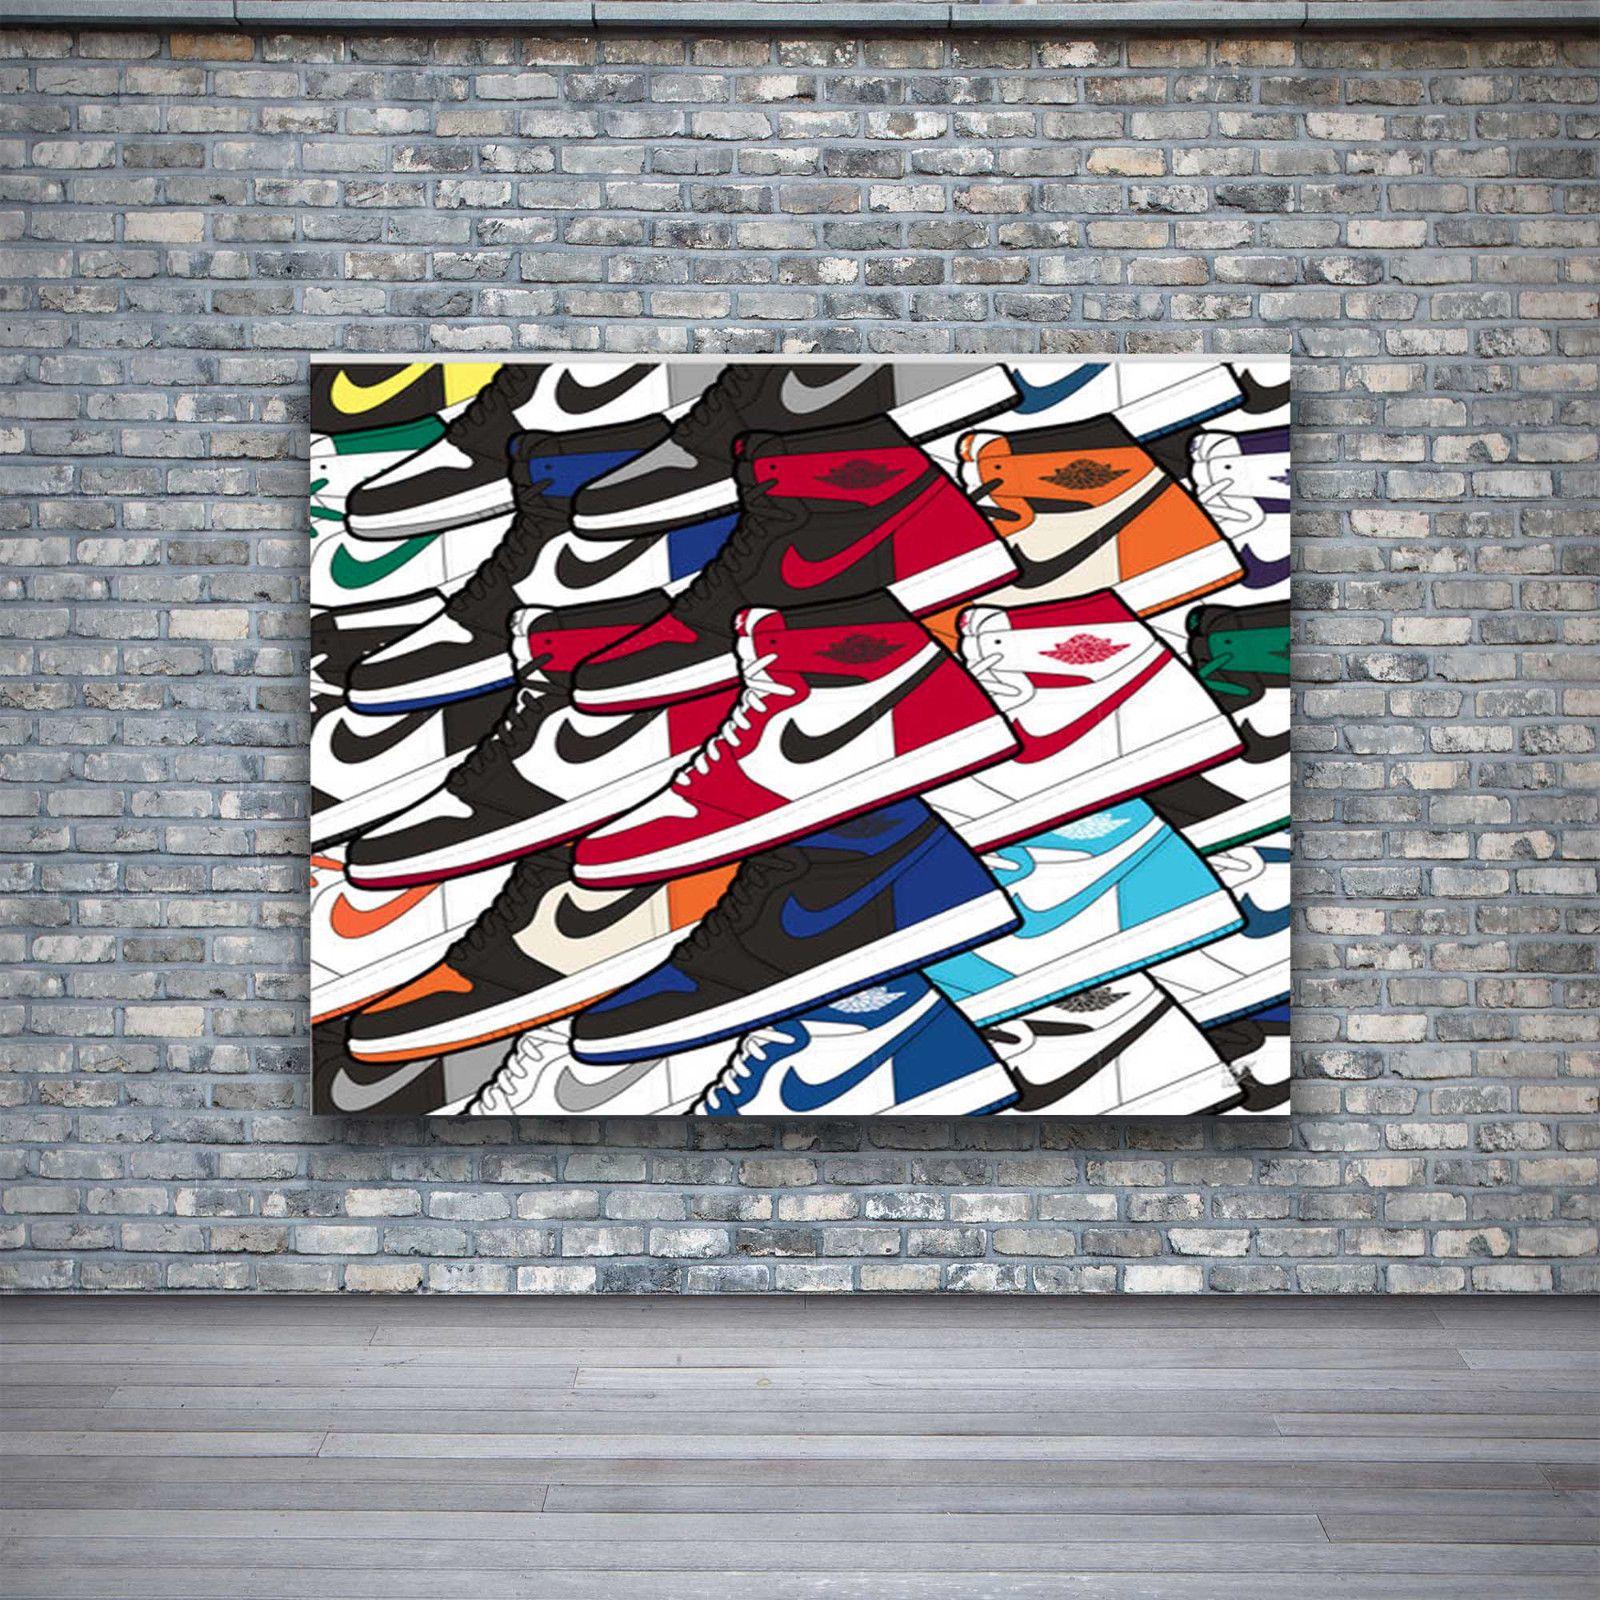 Air Jordan 1 Colorful Design Wall Art Canvas Print Poster $25.0 | Wall art designs, Canvas ...